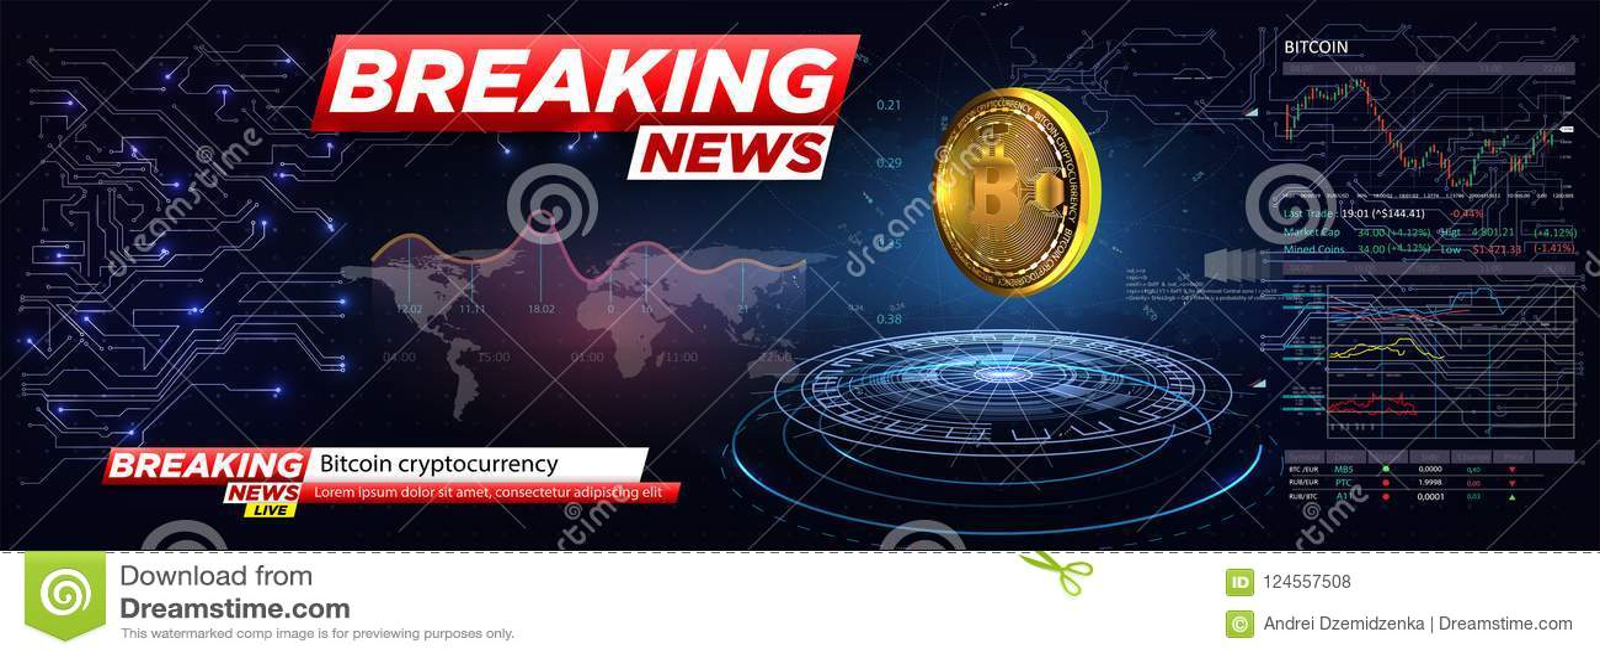 THE BREAKING NEWS OF KOKRAJHAR ( B T C)